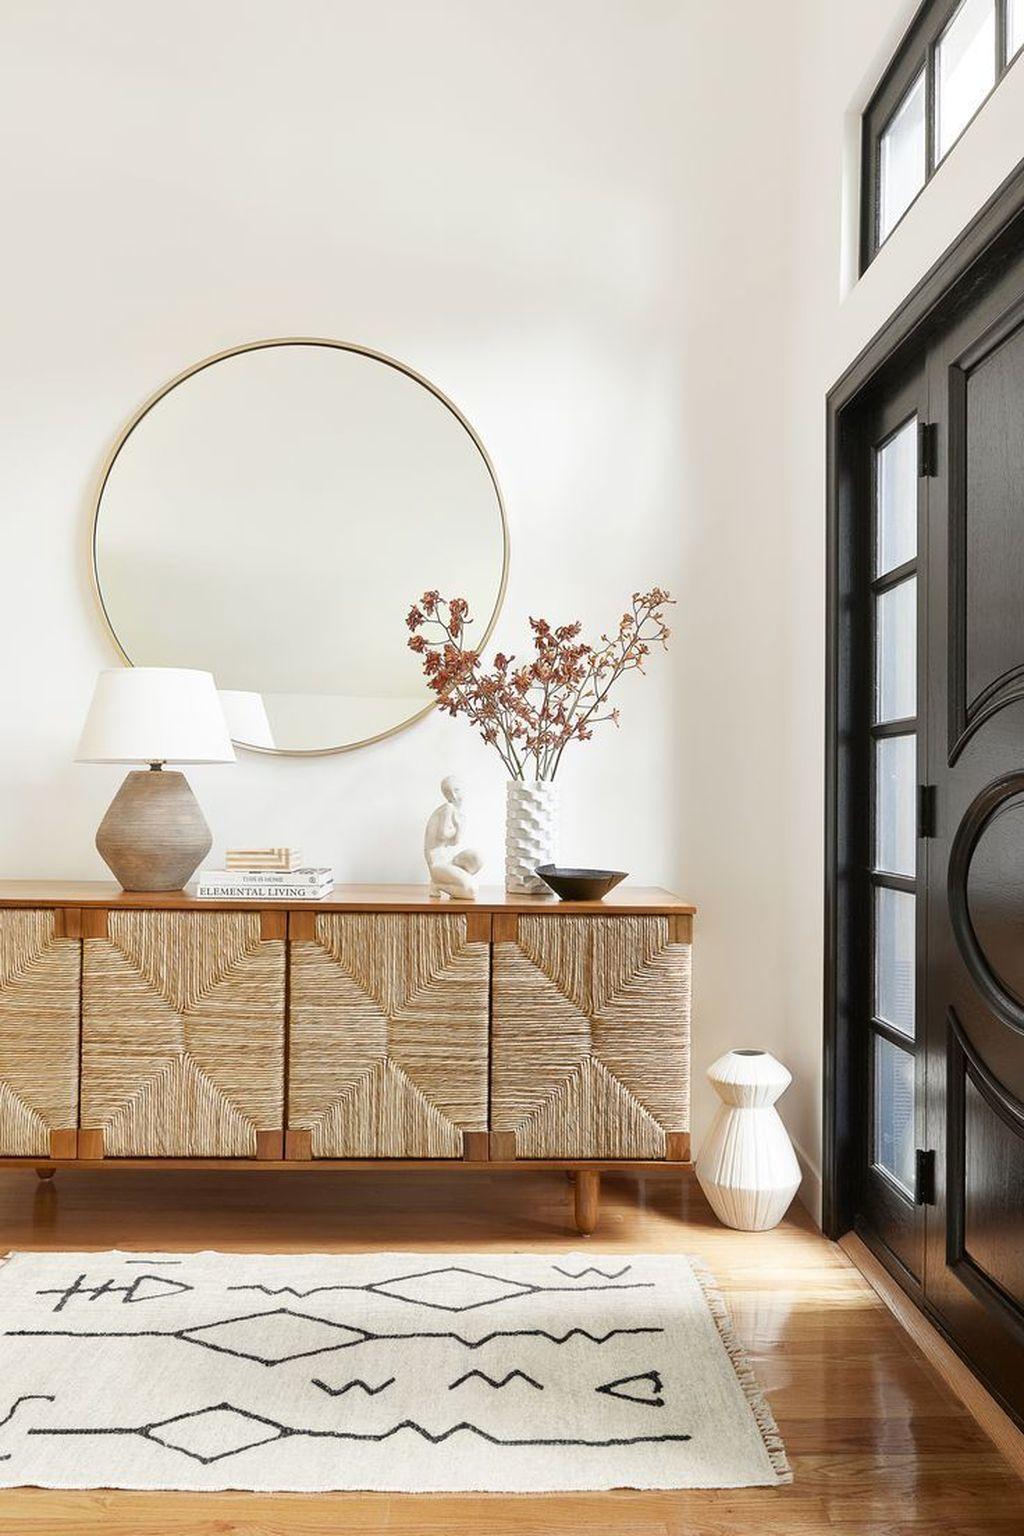 Inspiring Modern Home Furnishings Design Ideas 13